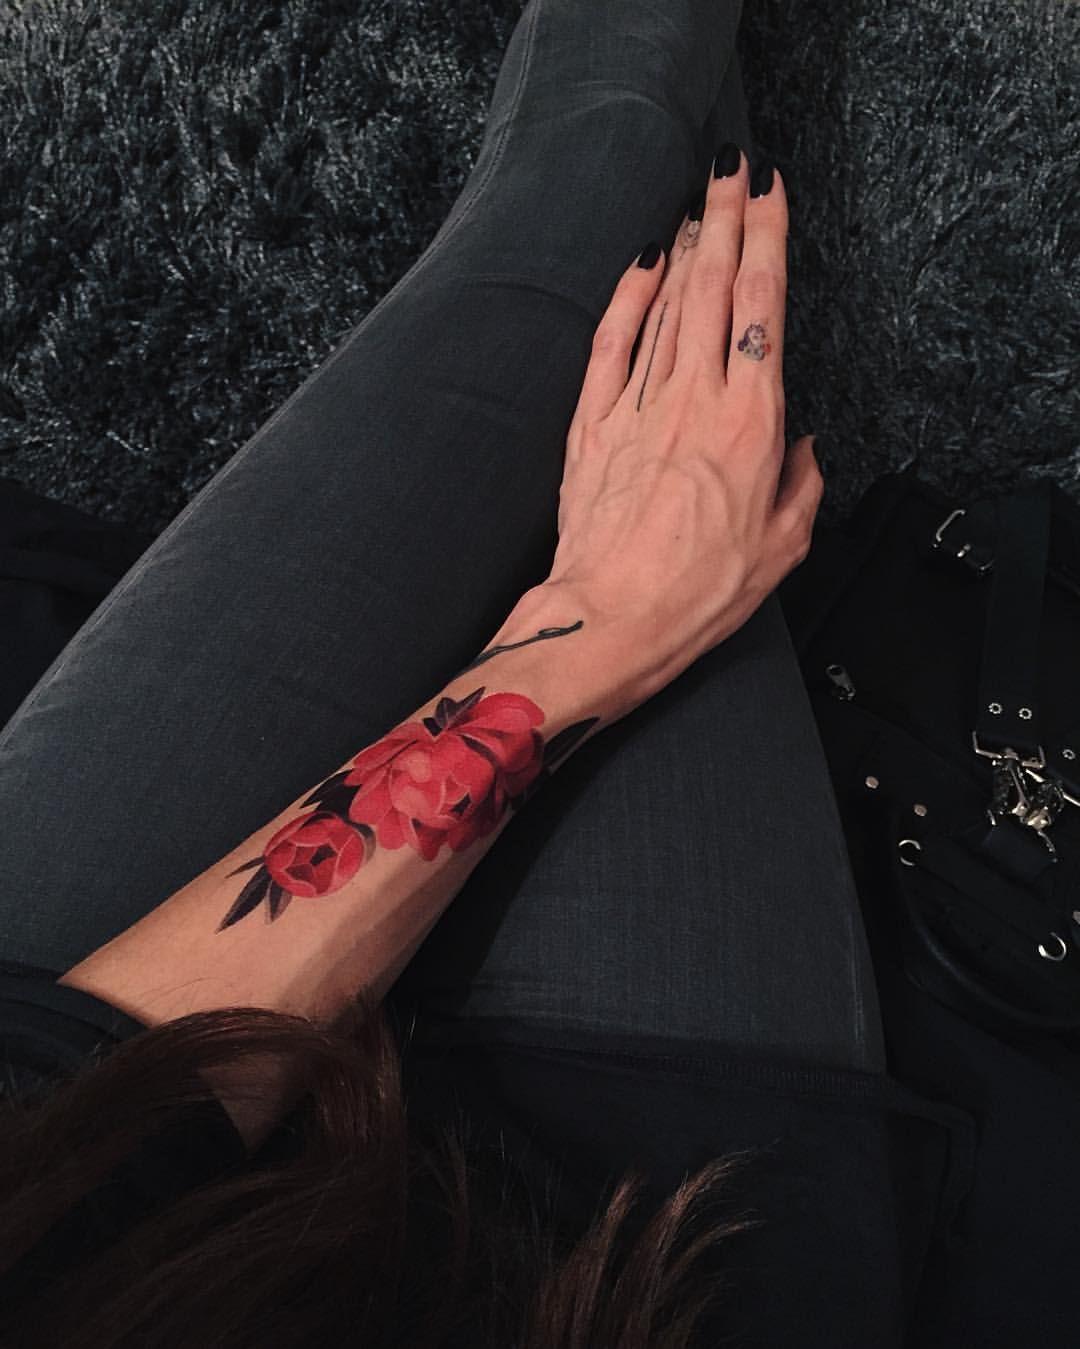 Как настоящая ❤️Это переводная татуировка @madebytattooyou design by @sashaunisex #temporarytattoo #rosetattoo #love #moscow  (at Vero's Place)